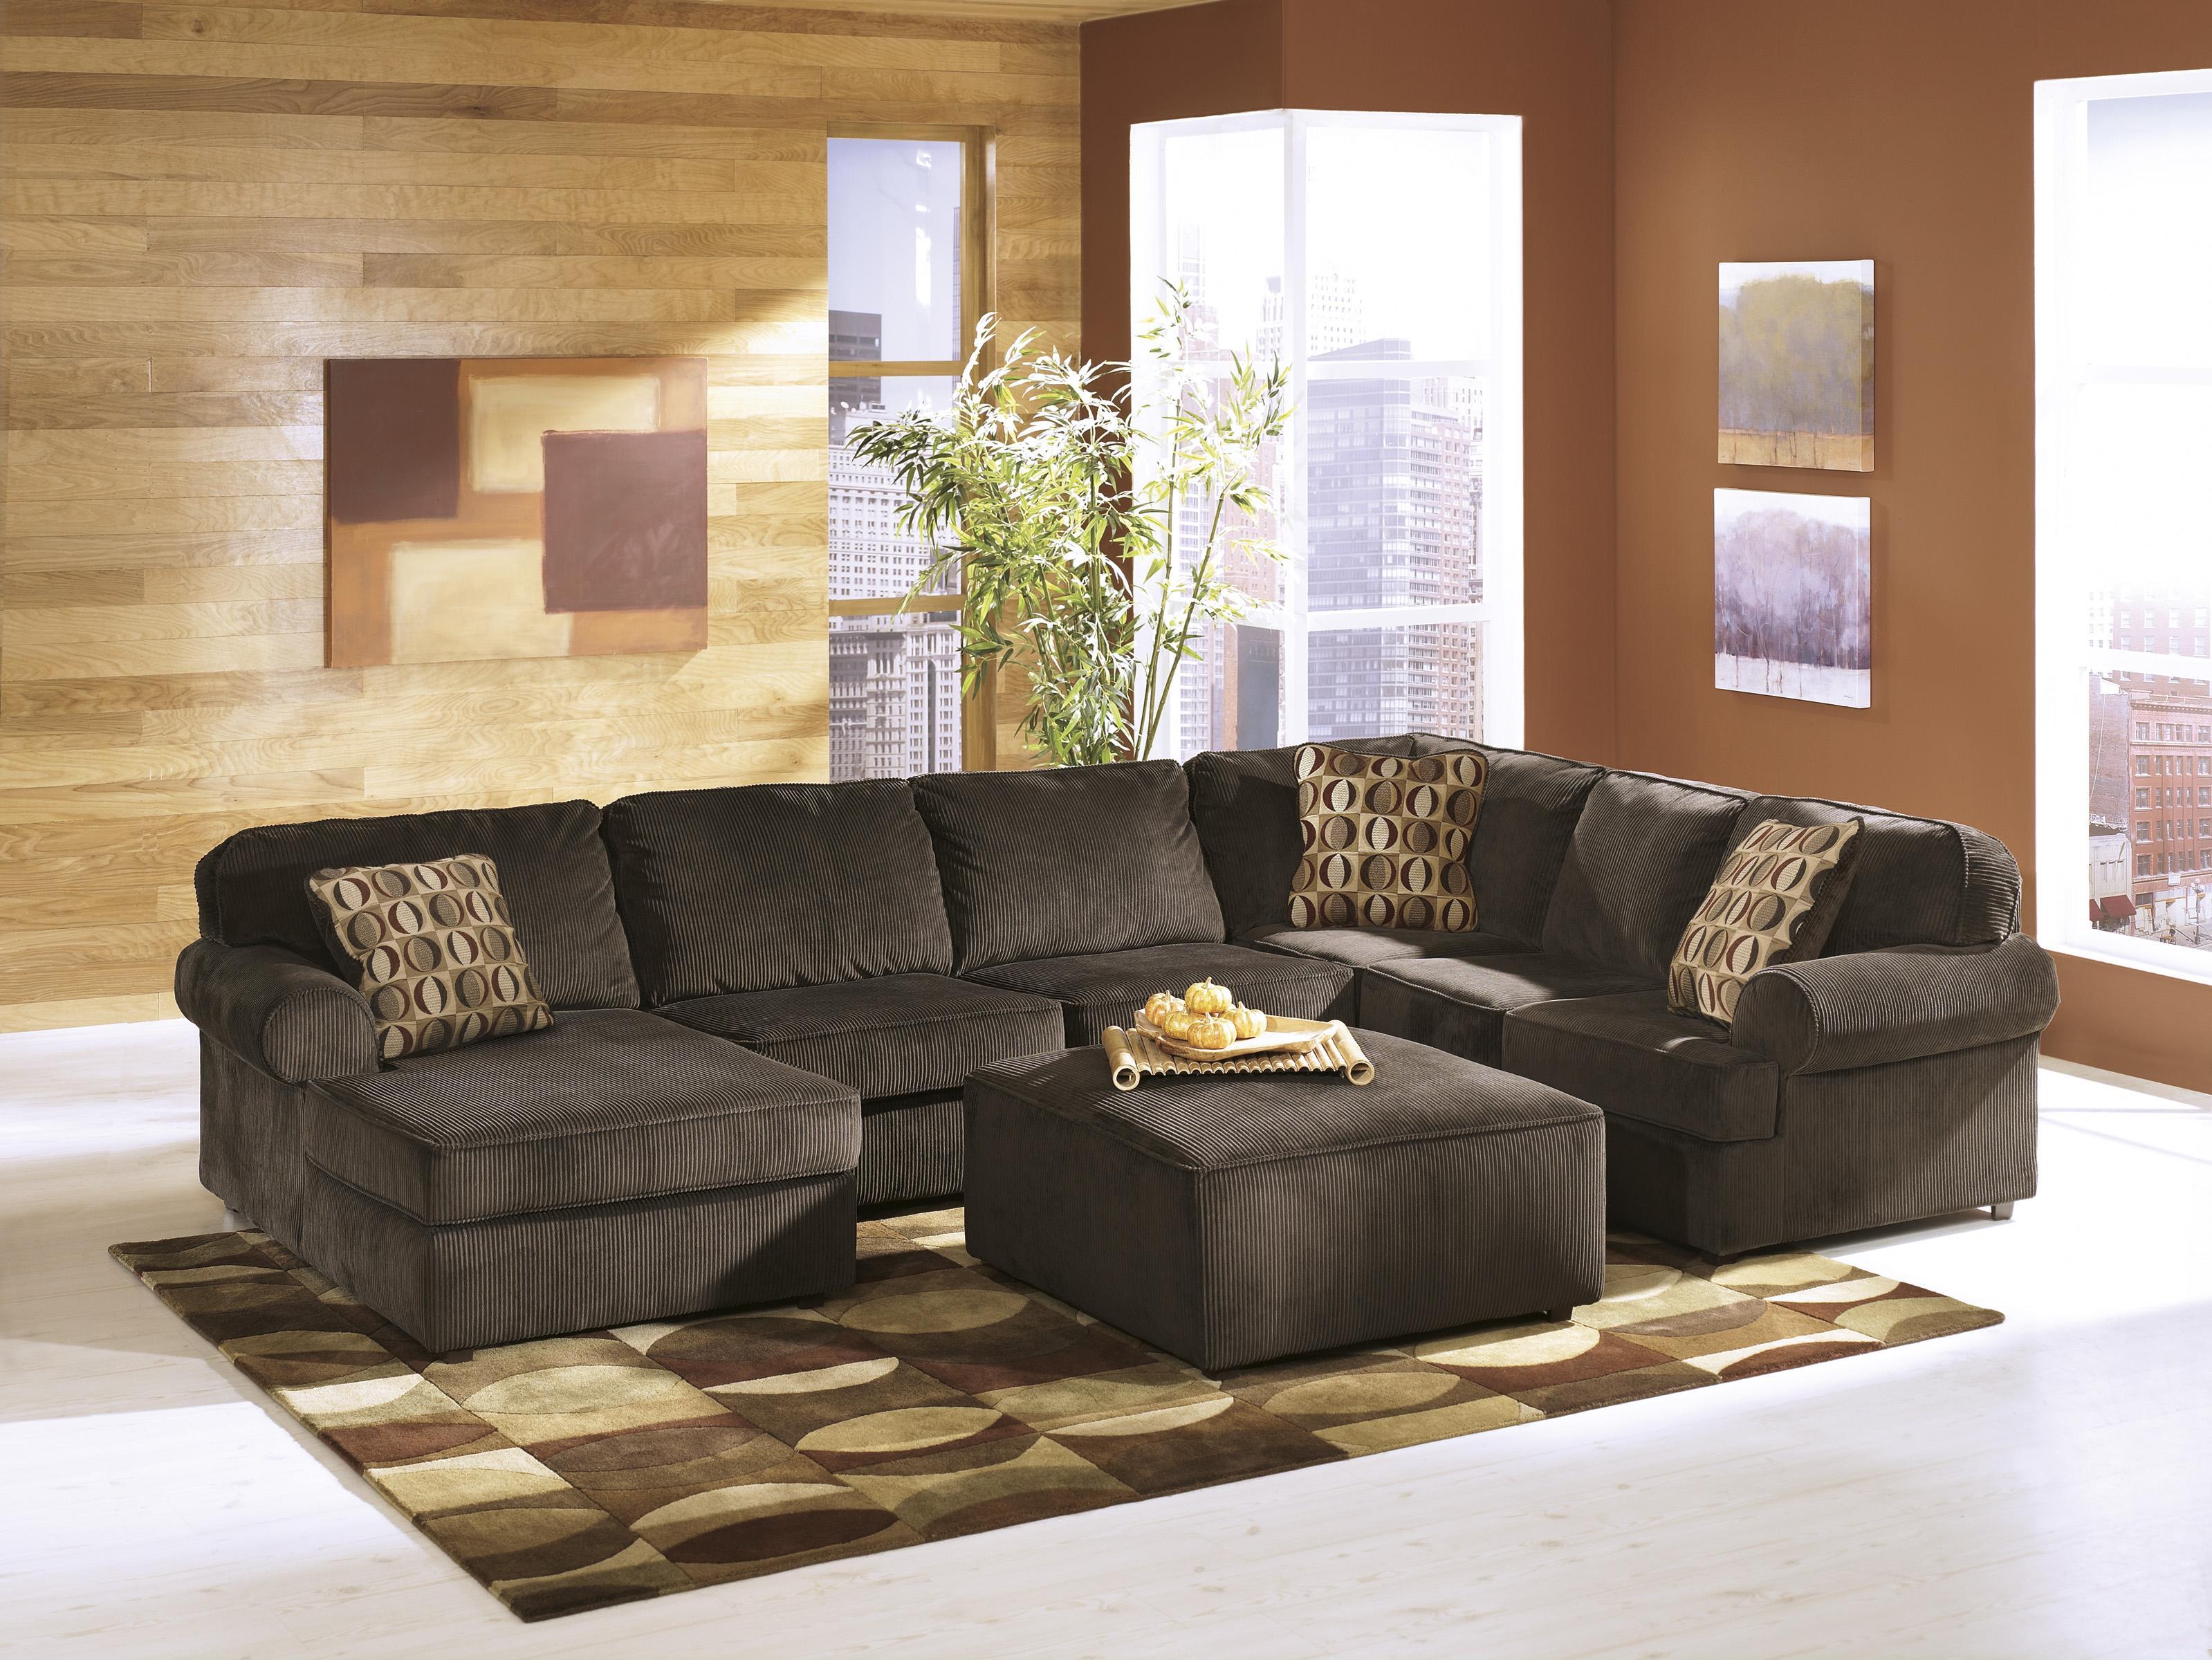 Ashley Furniture Vista Chocolate Stationary Living Room Group Olinde 39 S Furniture